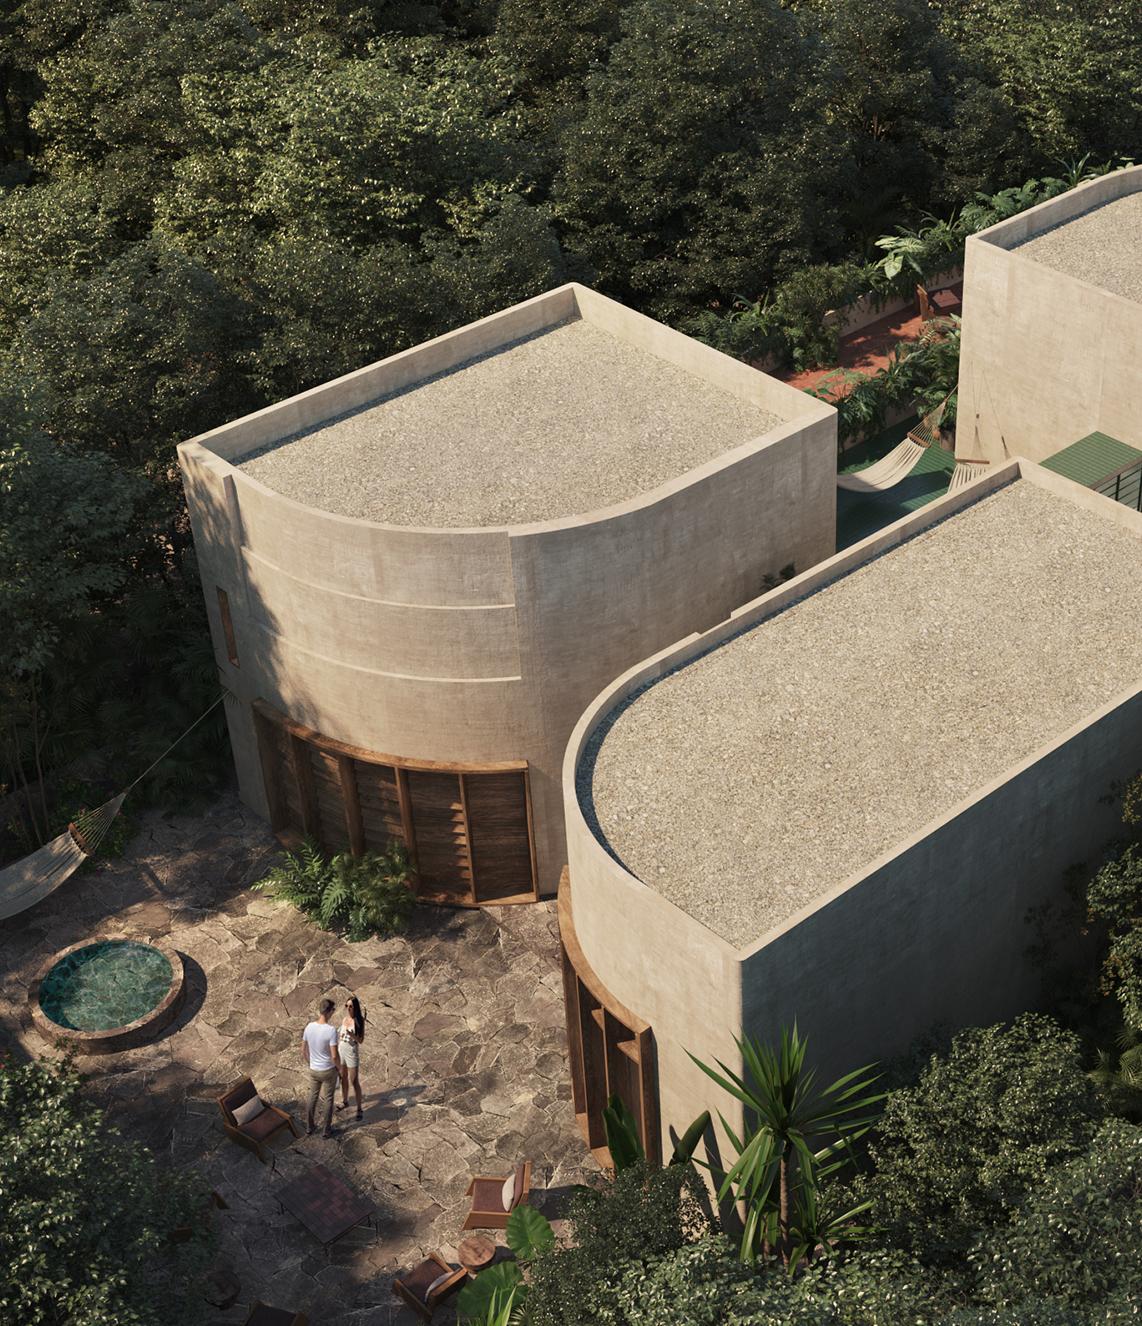 Casa SB, Mérida, Yucatán, México / 2021